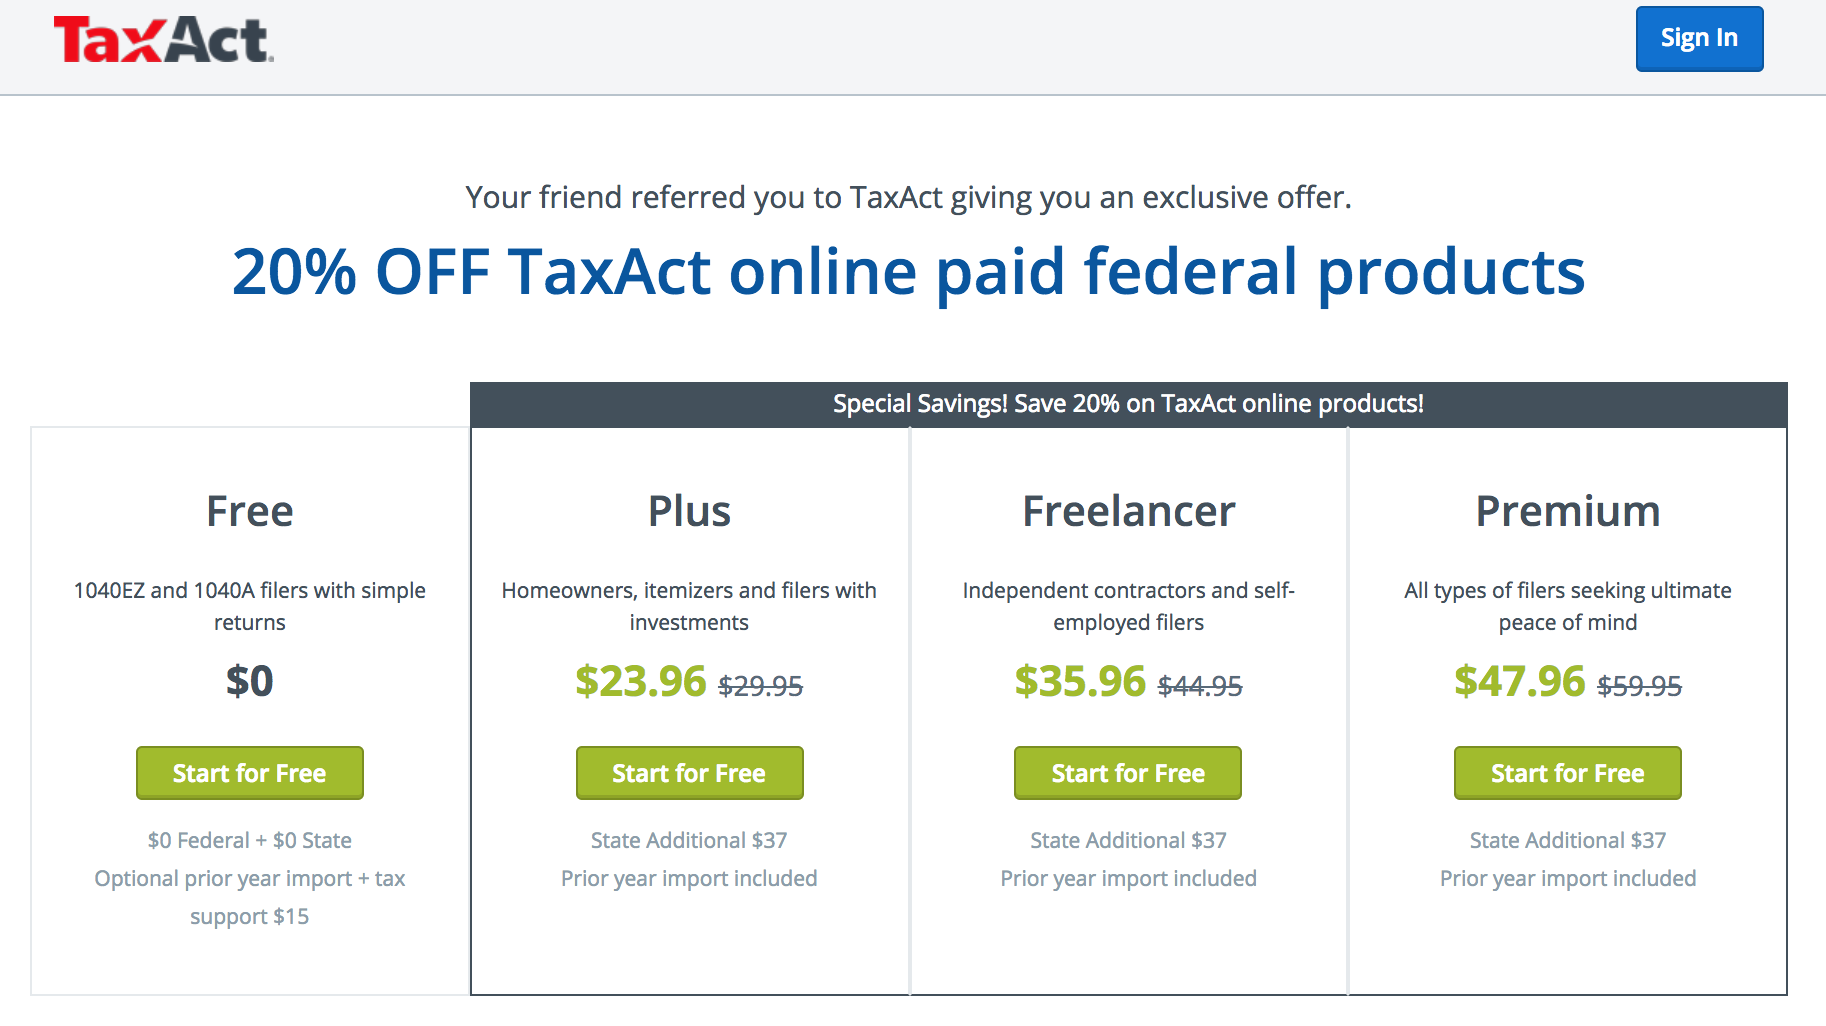 TaxAct promo code: 20% Off